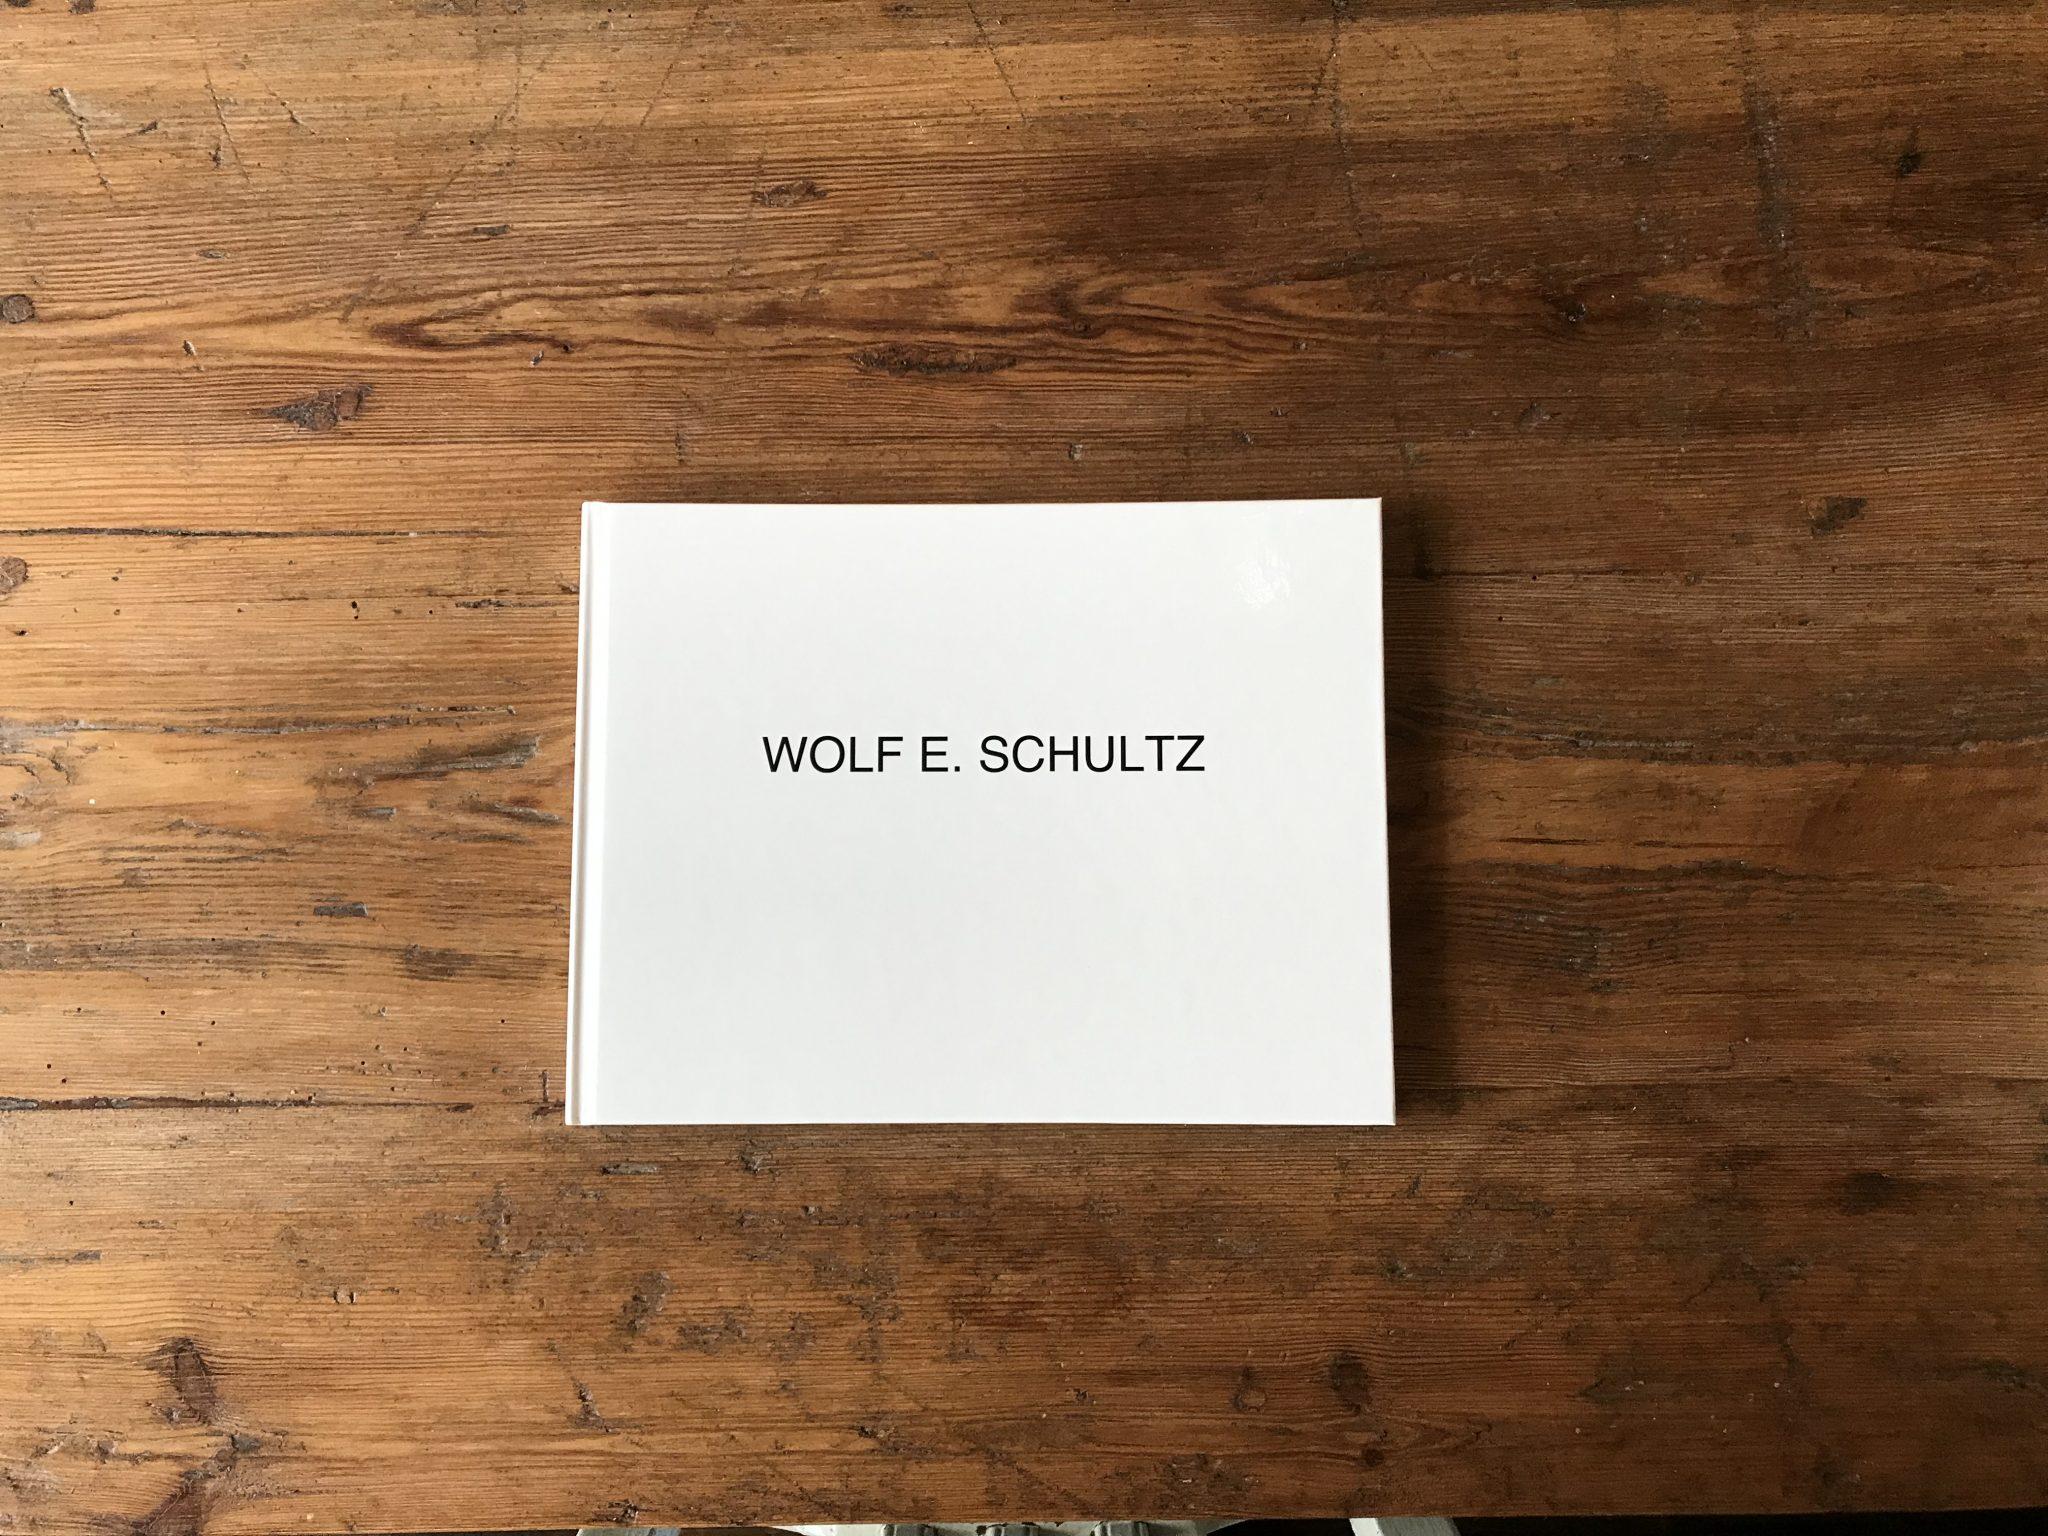 https://wolf-e-schultz.de/wp-content/uploads/2019/09/Katalog_WES_Wolf_E_Schultz-1.jpg